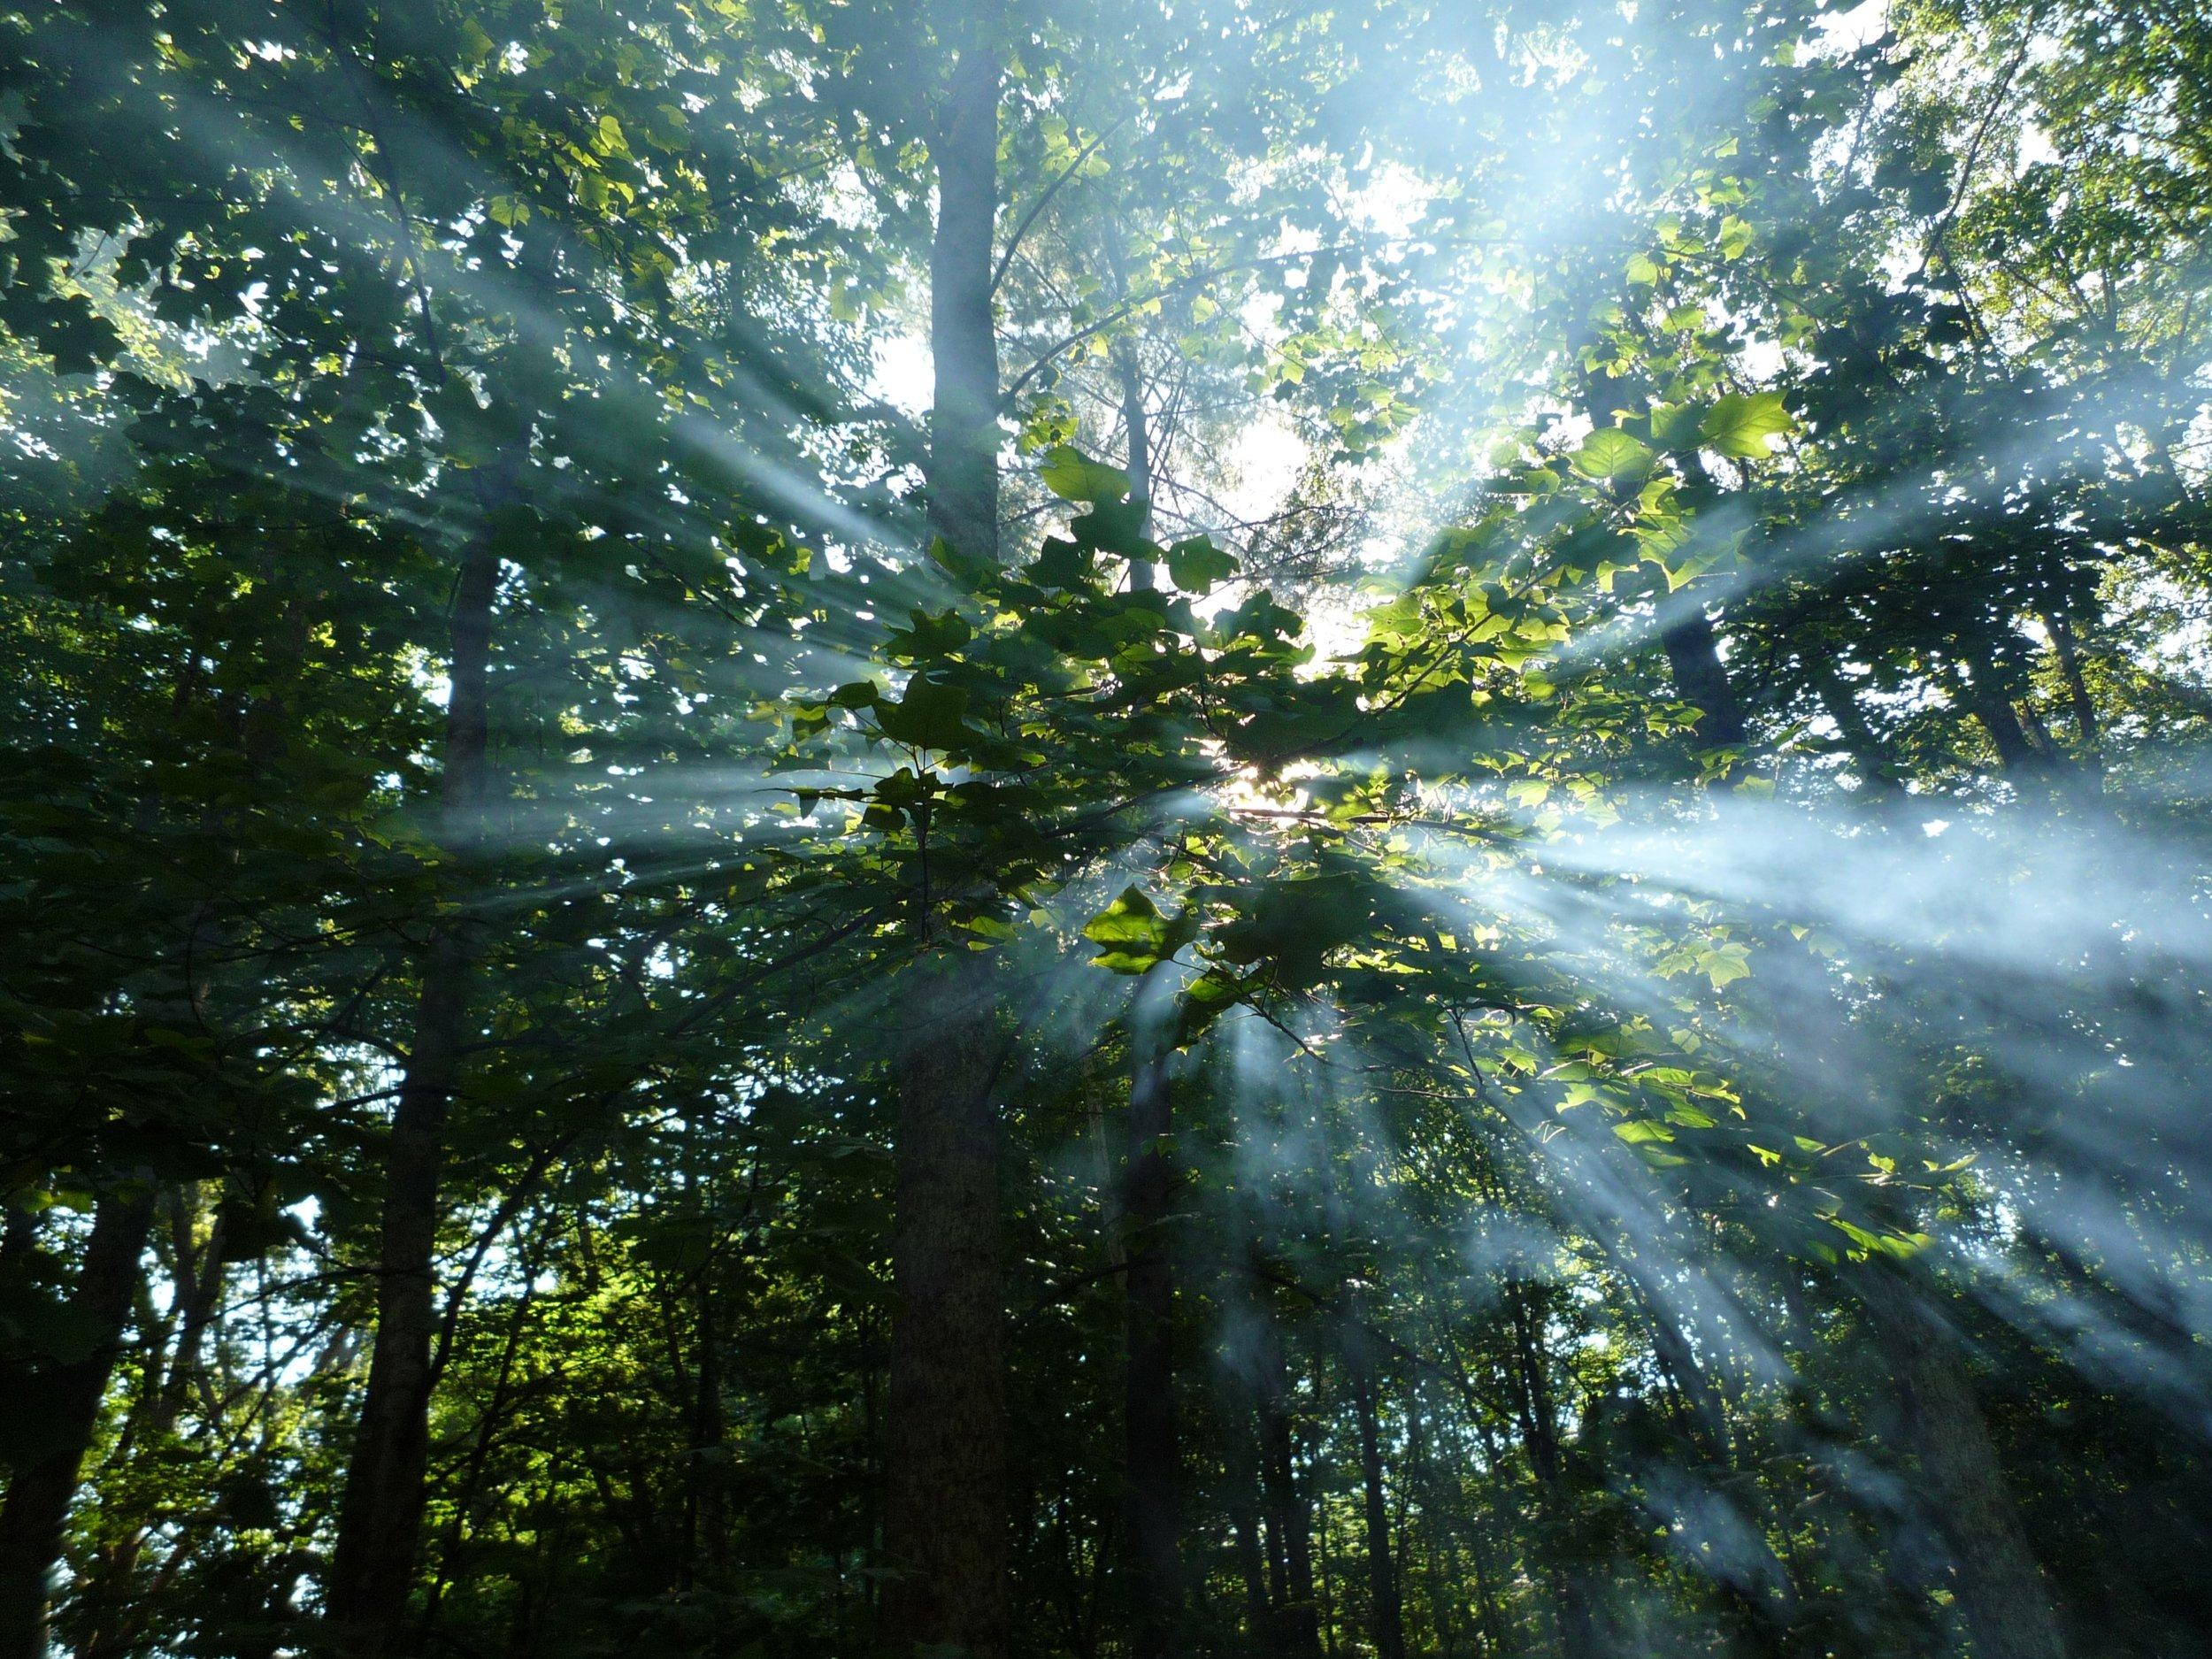 light-through-trees.jpg